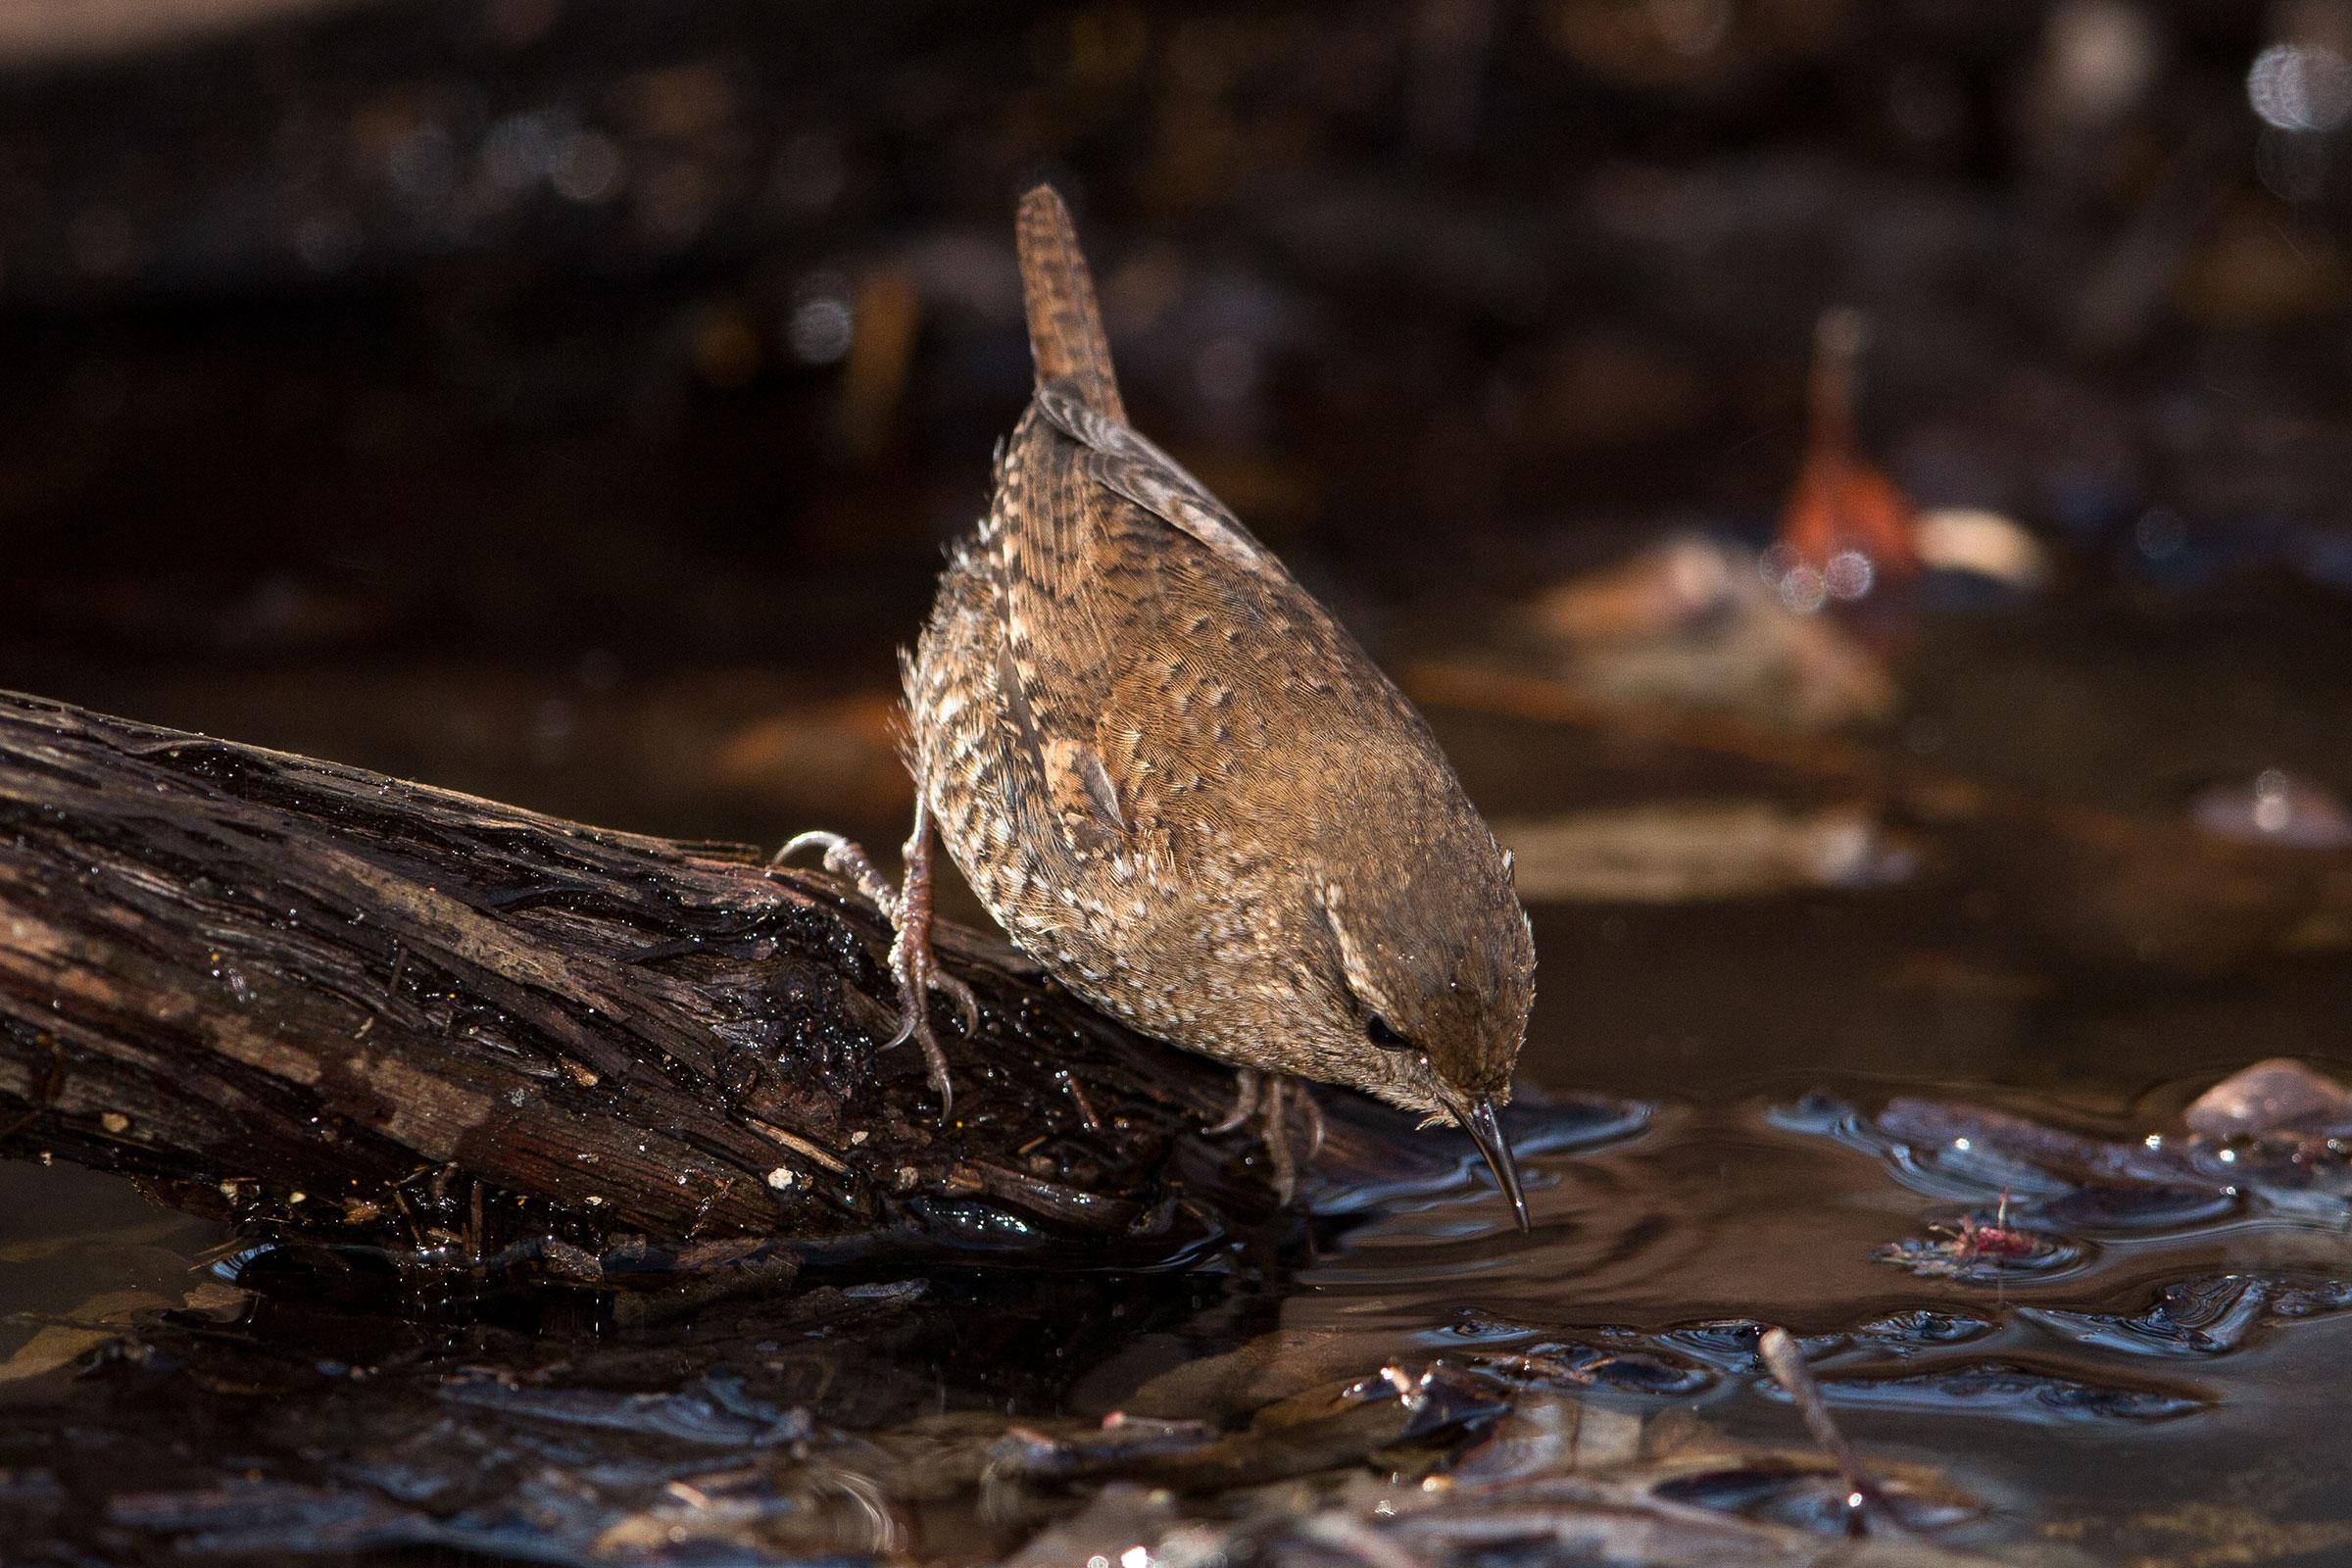 Winter Wren. Gary Robinette/Audubon Photography Awards